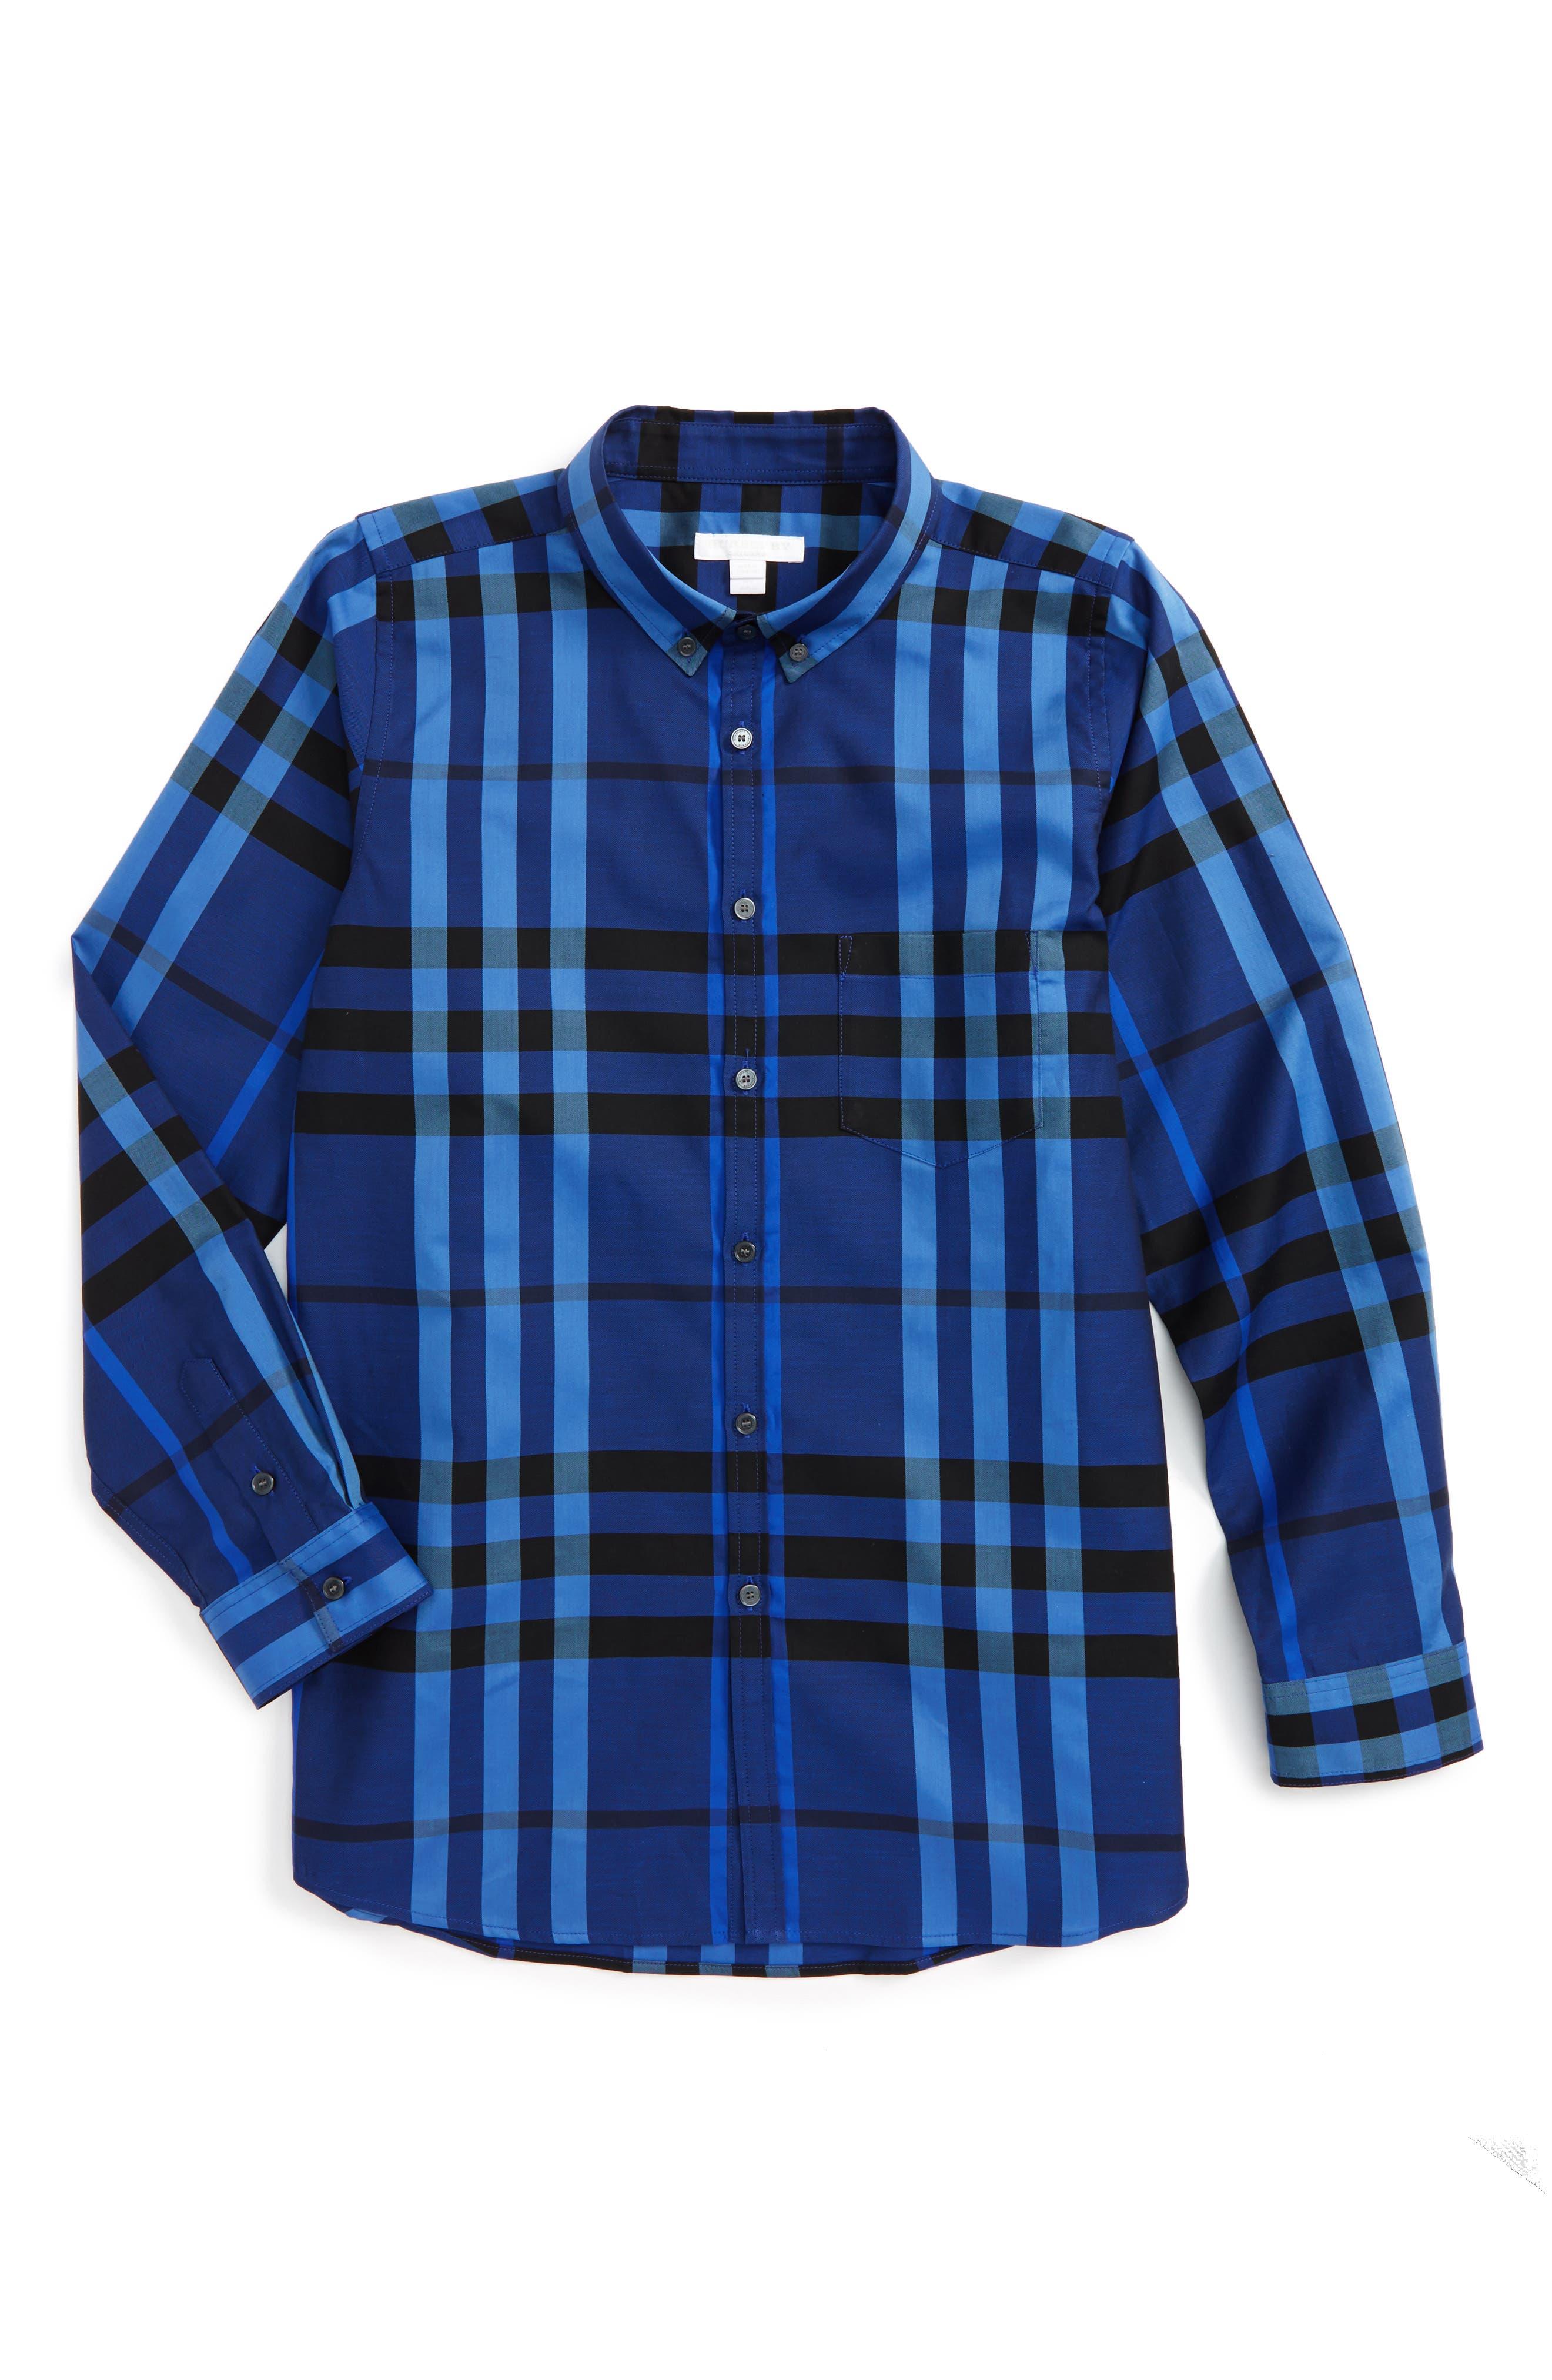 Alternate Image 1 Selected - Burberry Mini Fred Check Woven Shirt (Little Boys & Big Boys)